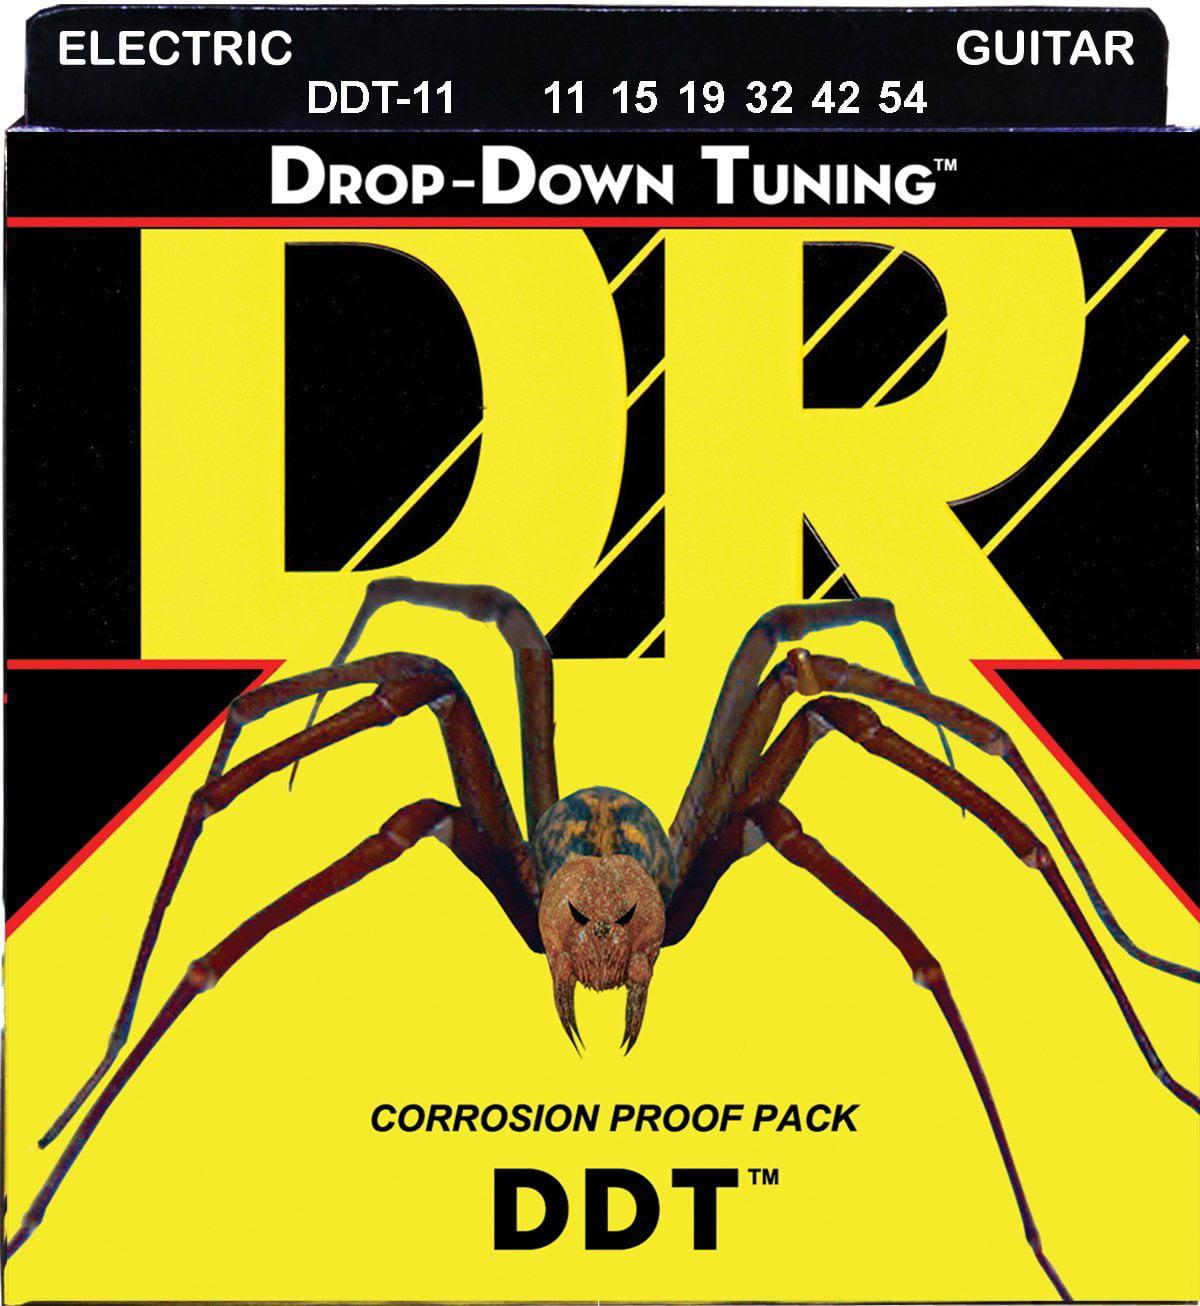 DR Strings DDT-11 Nickel Plated Electric Guitar Strings, Heavy by DR Strings